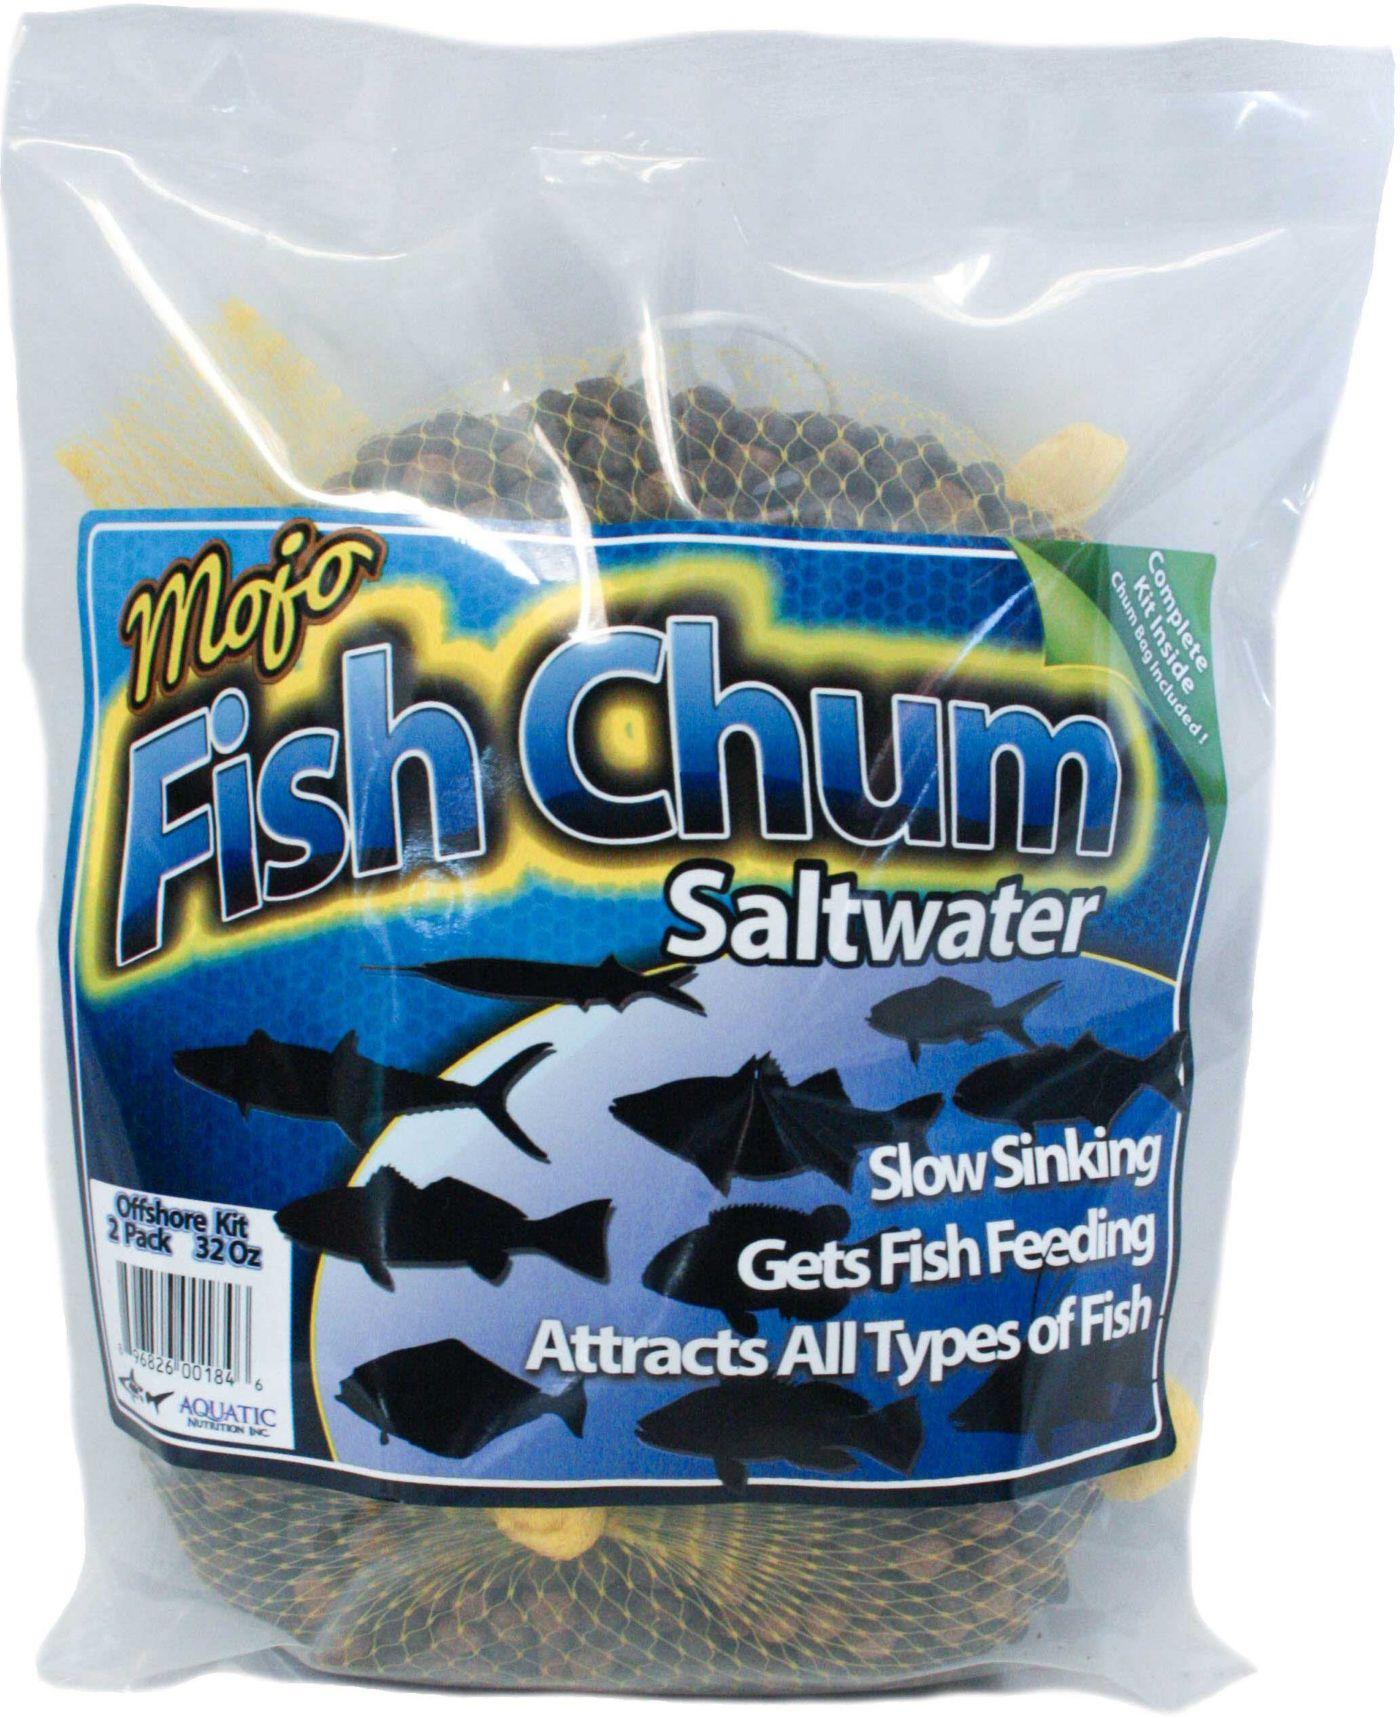 Aquatic Nutrition Mojo Saltwater Fish Chum